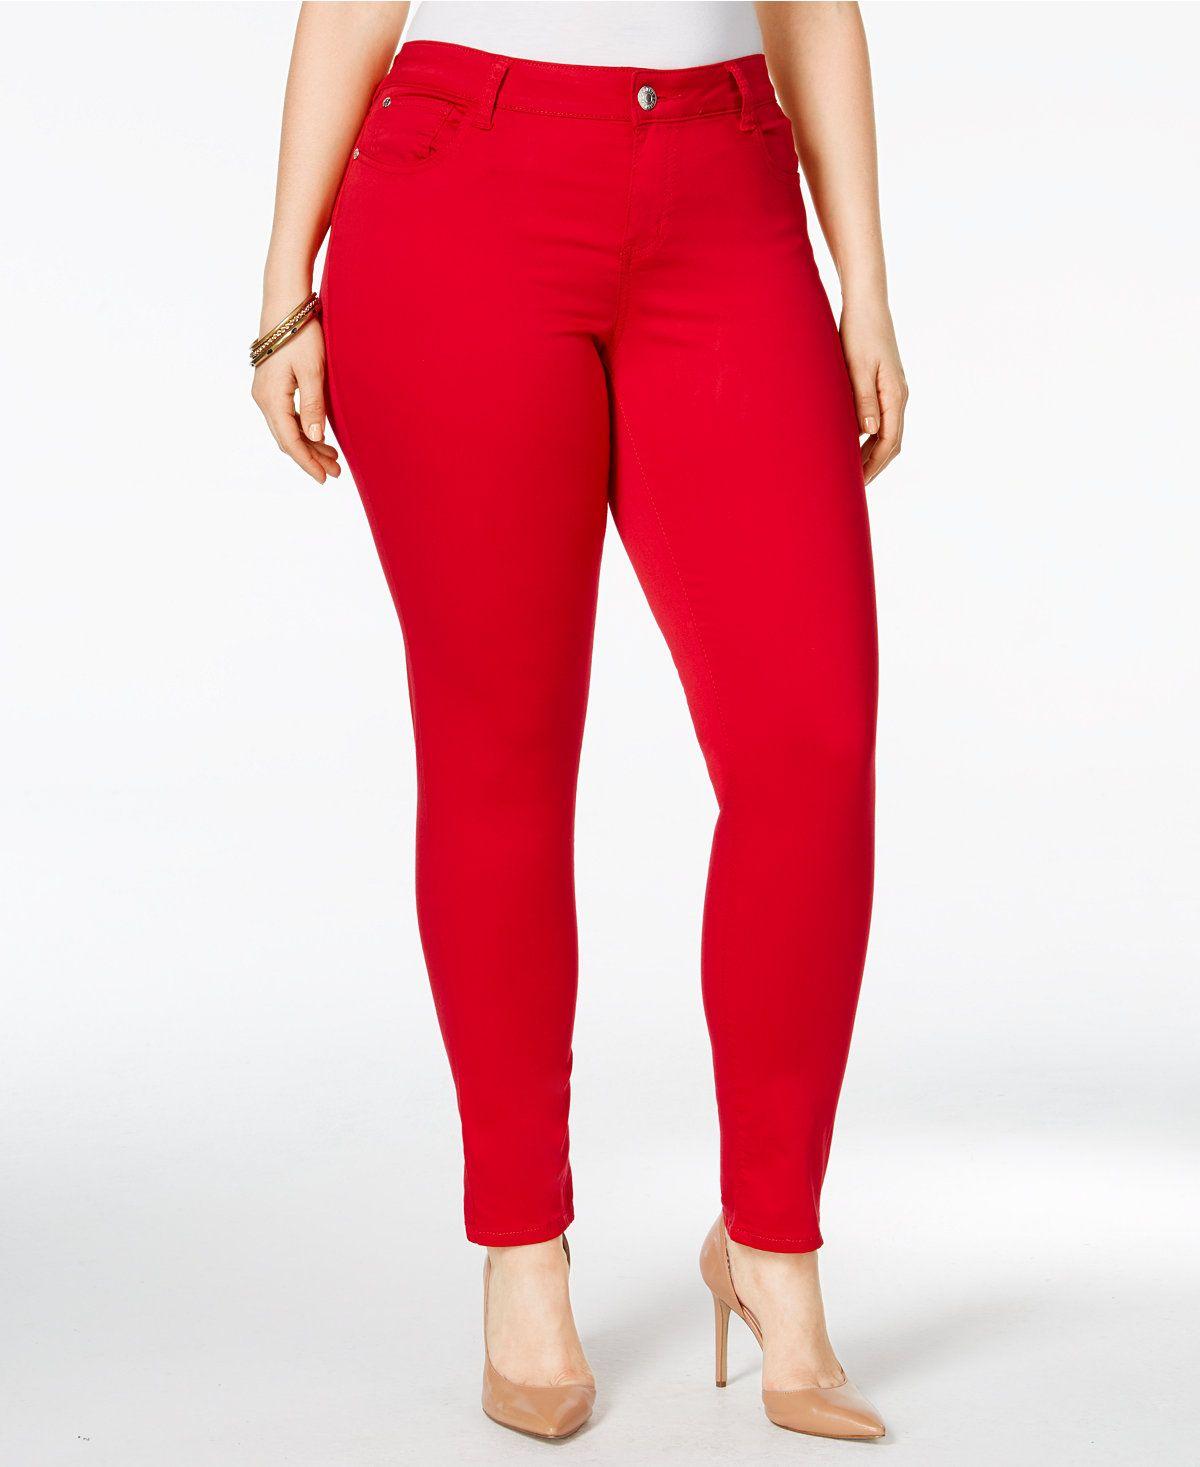 d0e4aebc3c441 Celebrity Pink Trendy Plus Size Colored Wash Skinny Jeans - Jeans - Plus  Sizes - Macy s